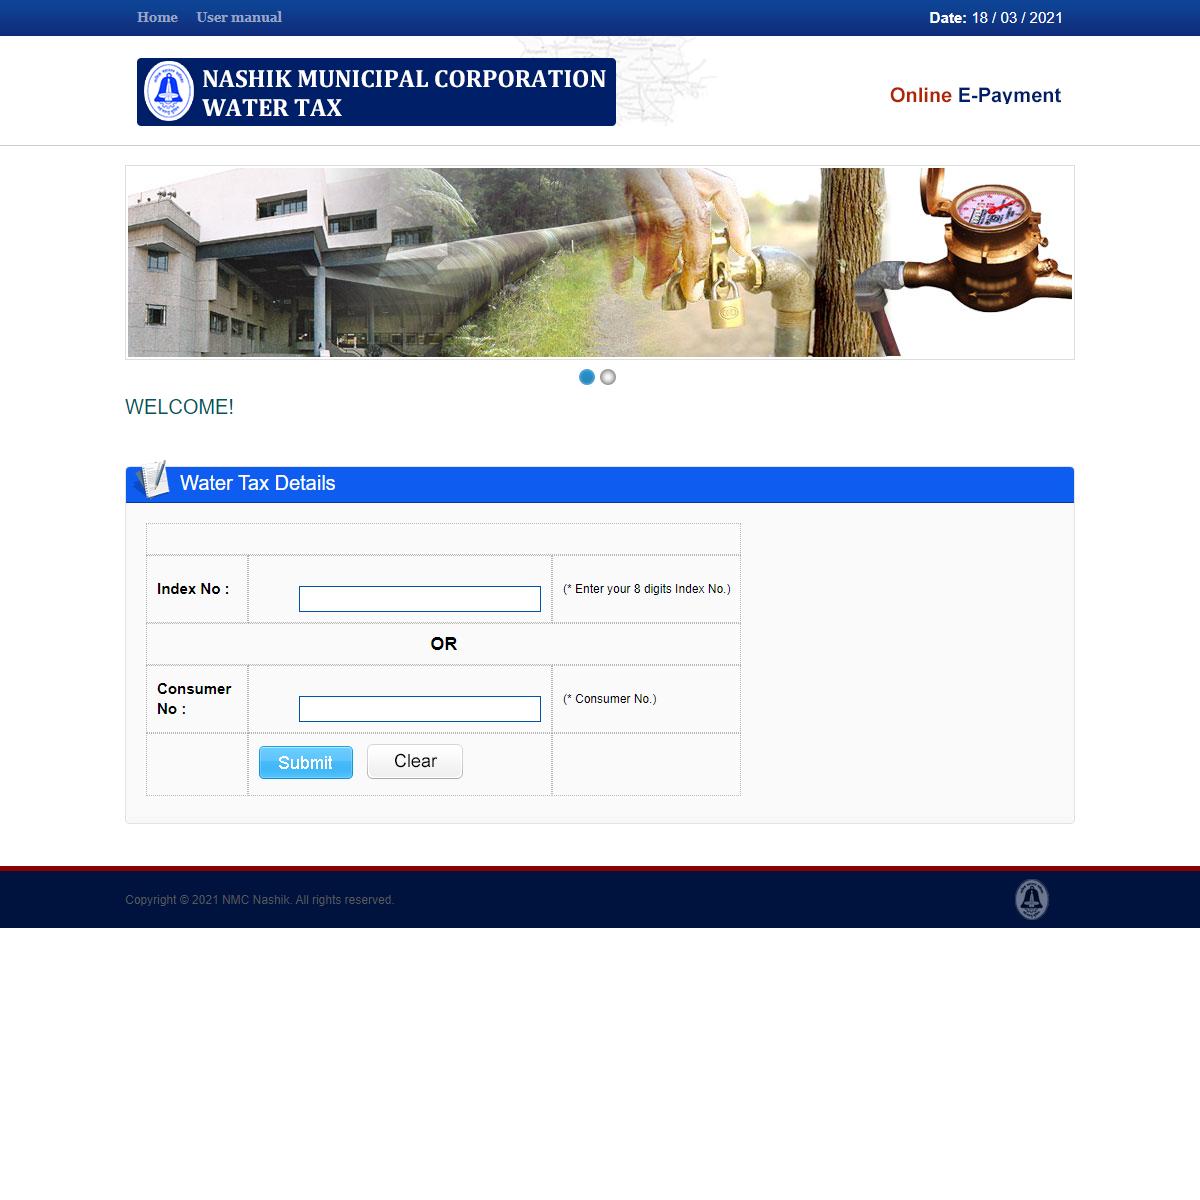 Water Tax Online